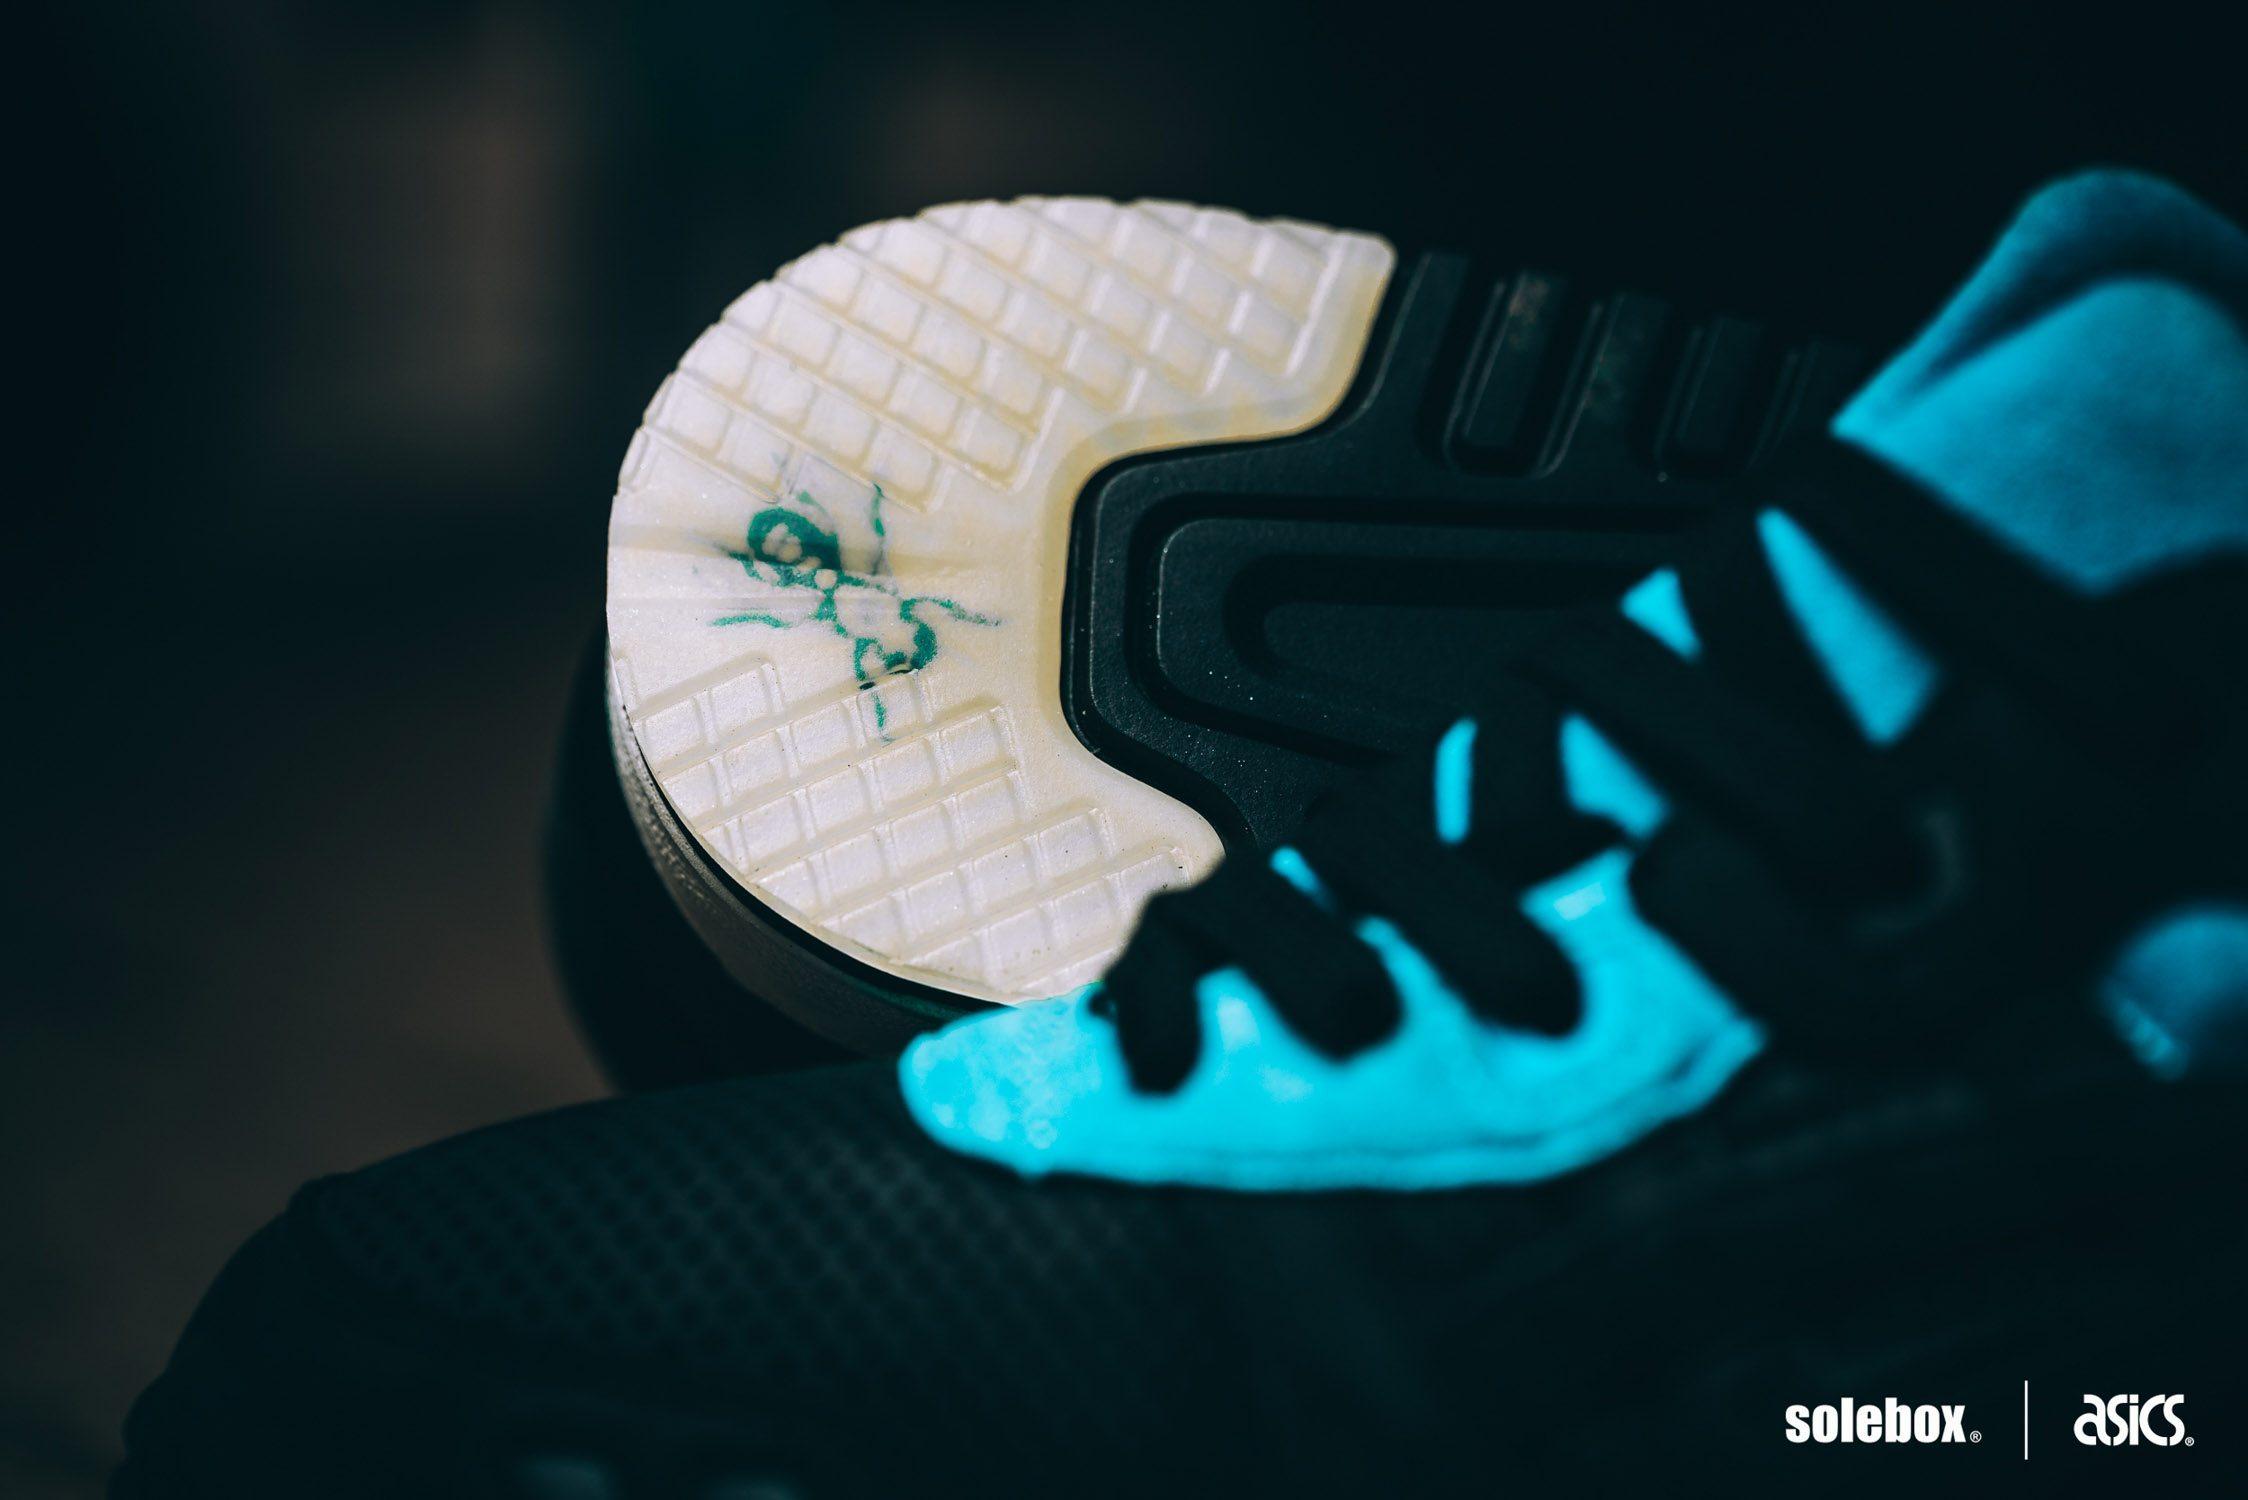 SOLEBOX x Asics Gel Lyte III 11